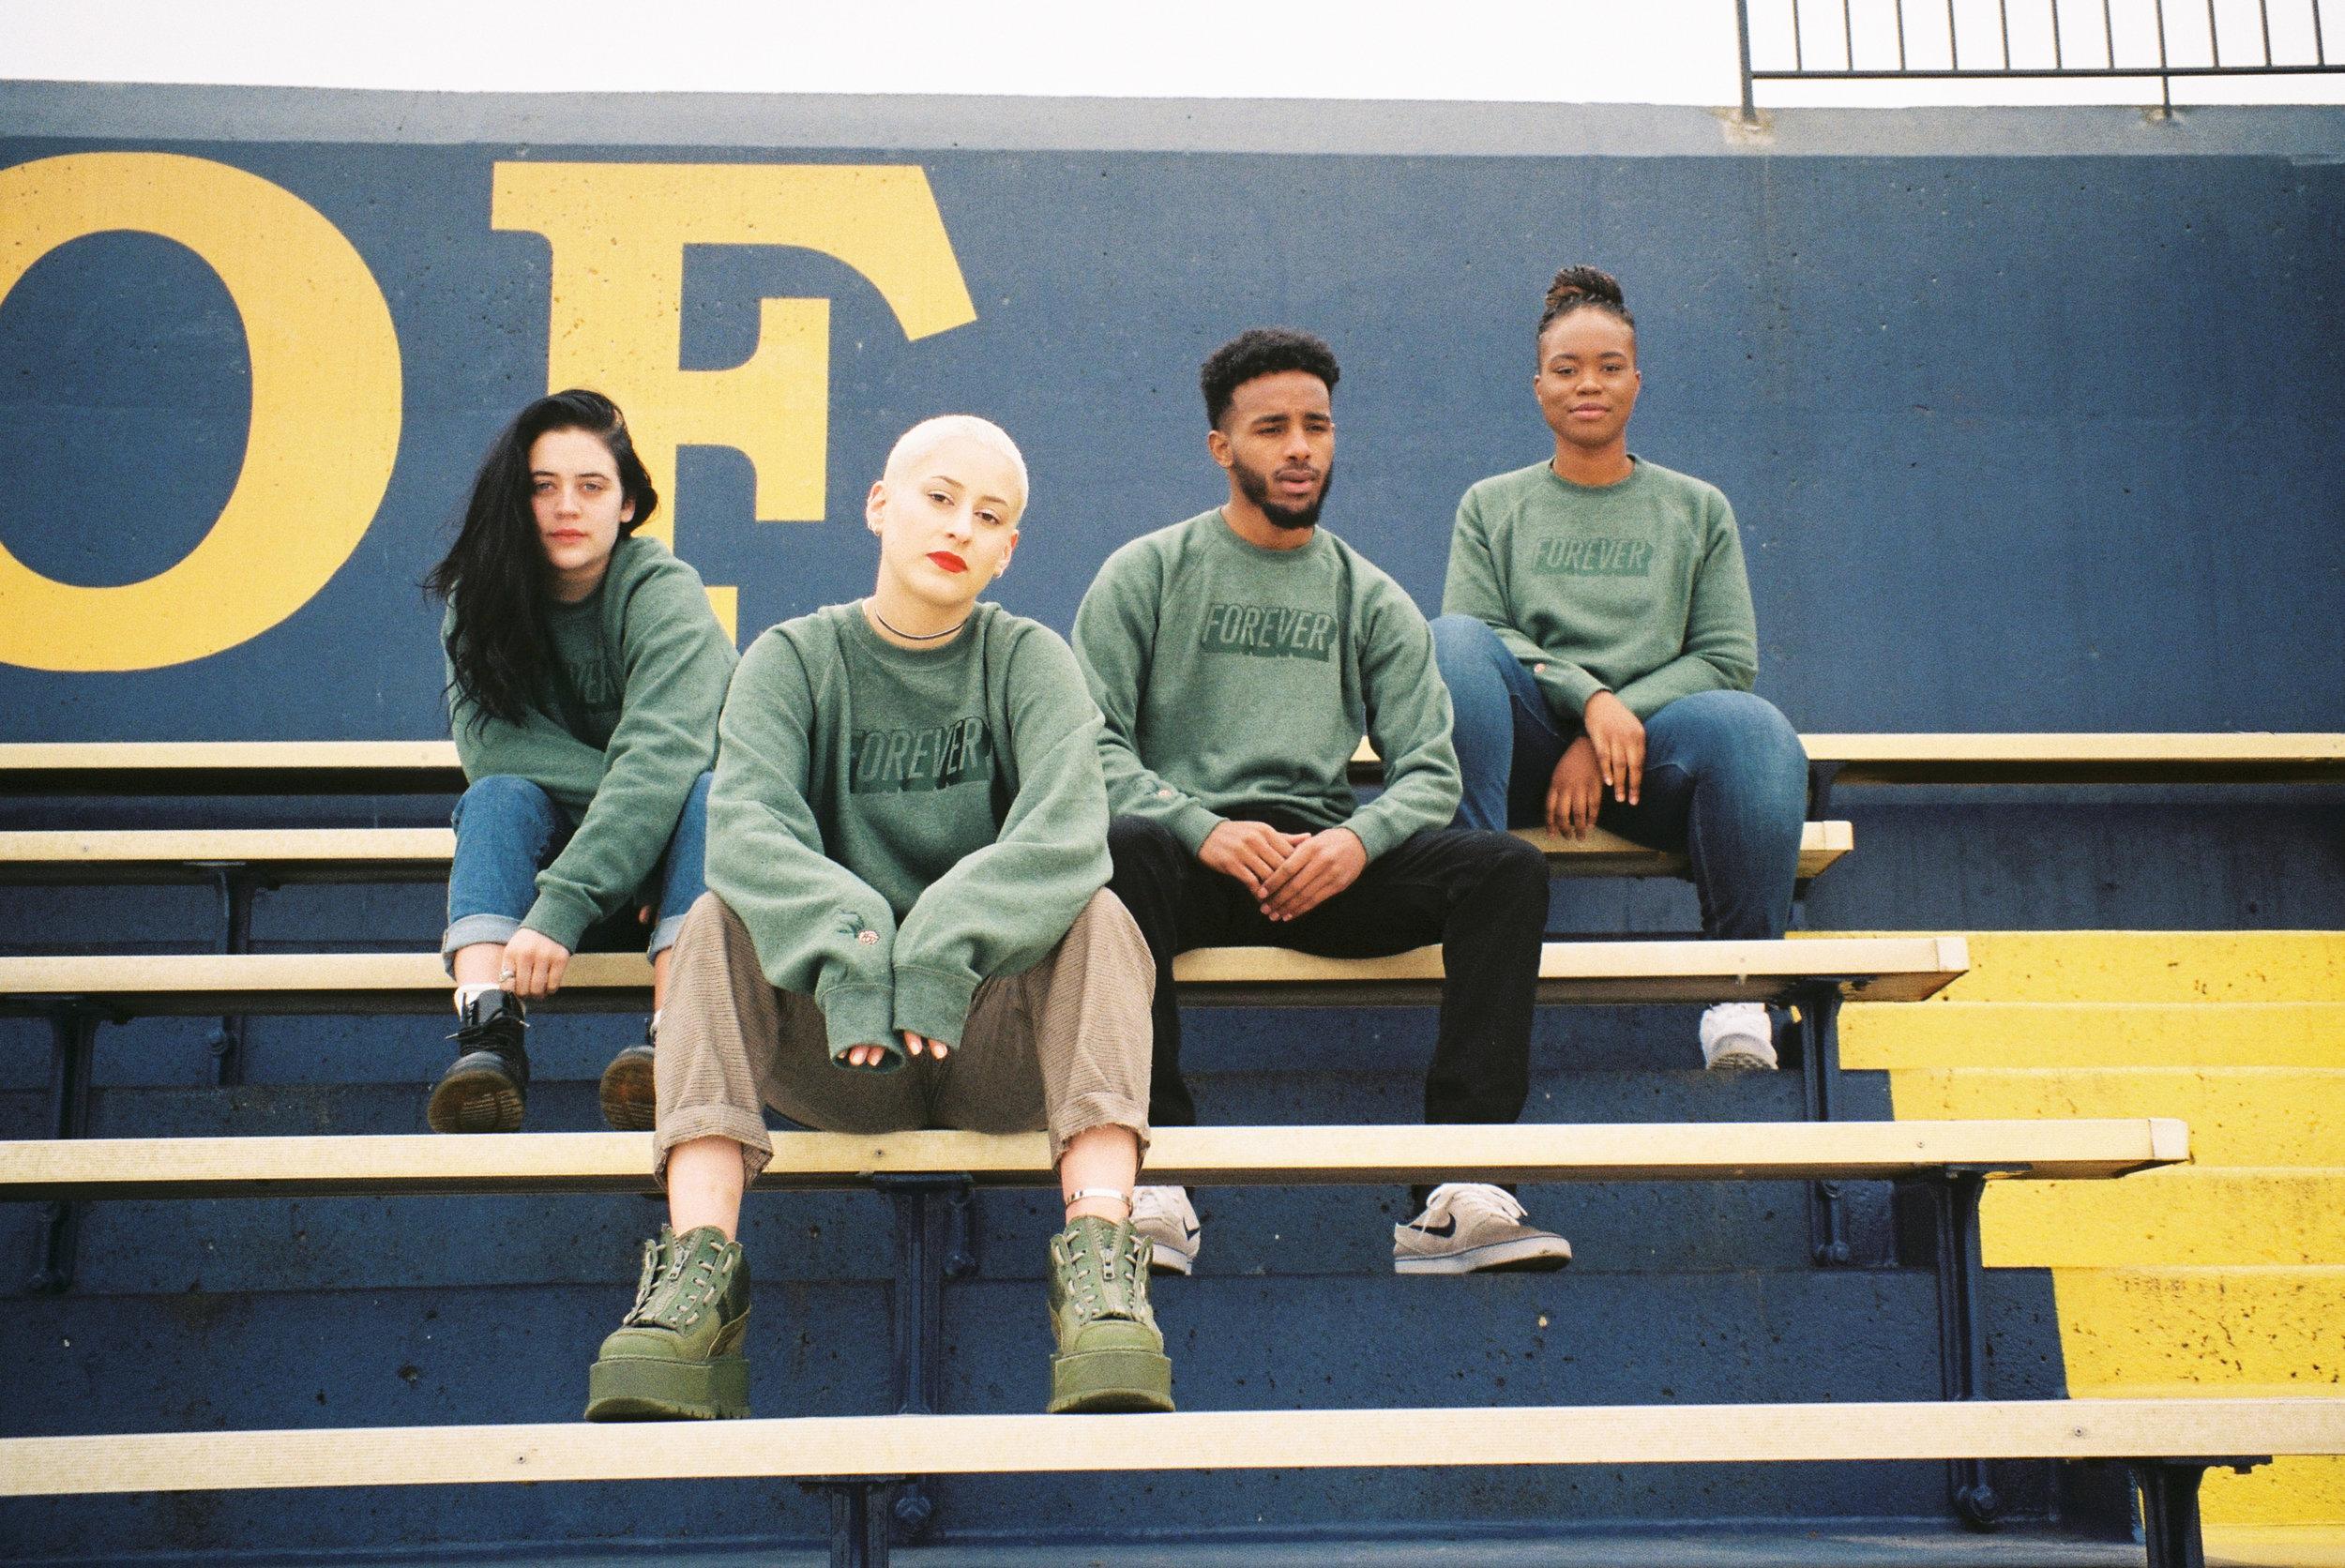 joyce.is-forever-sweatshirt-x-nylonsaddle-80.jpg